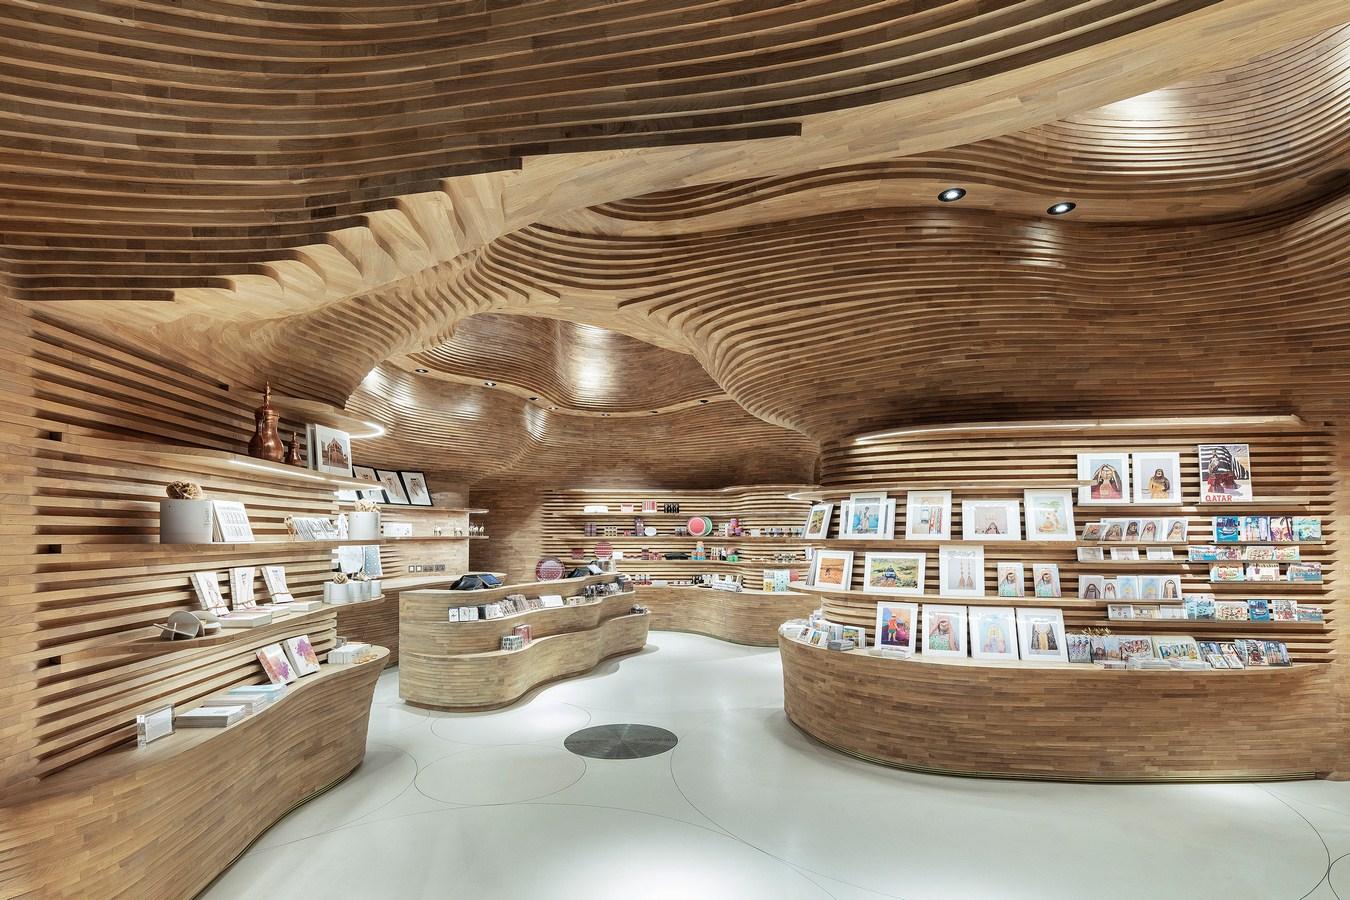 National Museum of Qatar Shop Interiors By Koichi Takada Architects - Sheet3